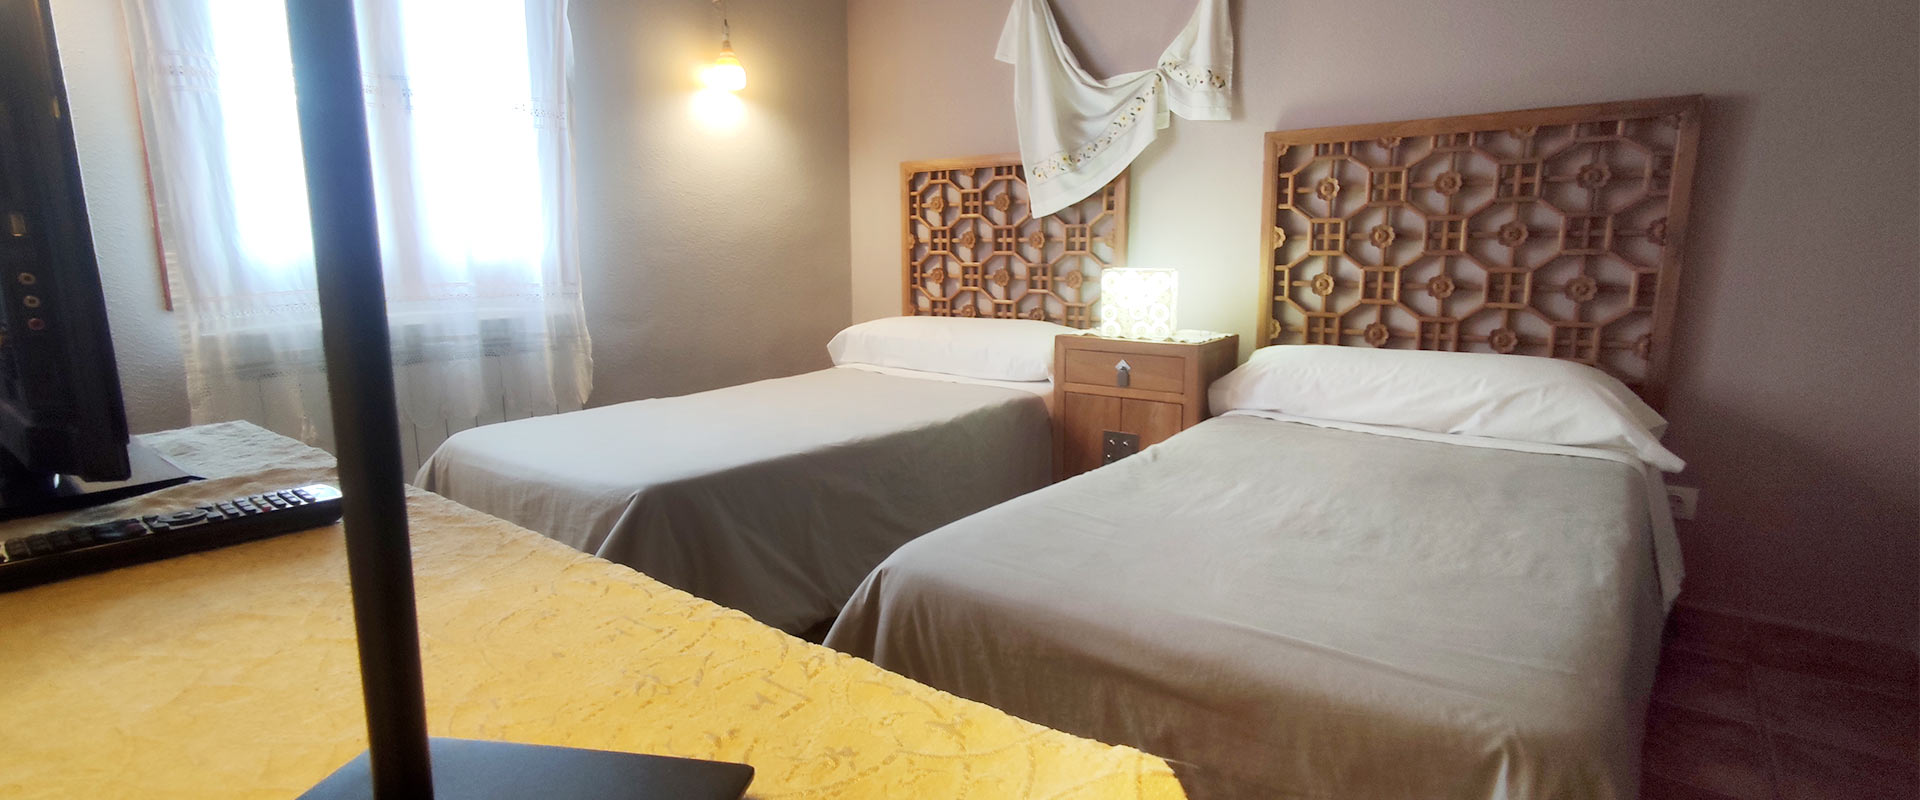 slider-habitacion-albahaca-dos-camas-individuales-cabecero-madera-casa-rural-t